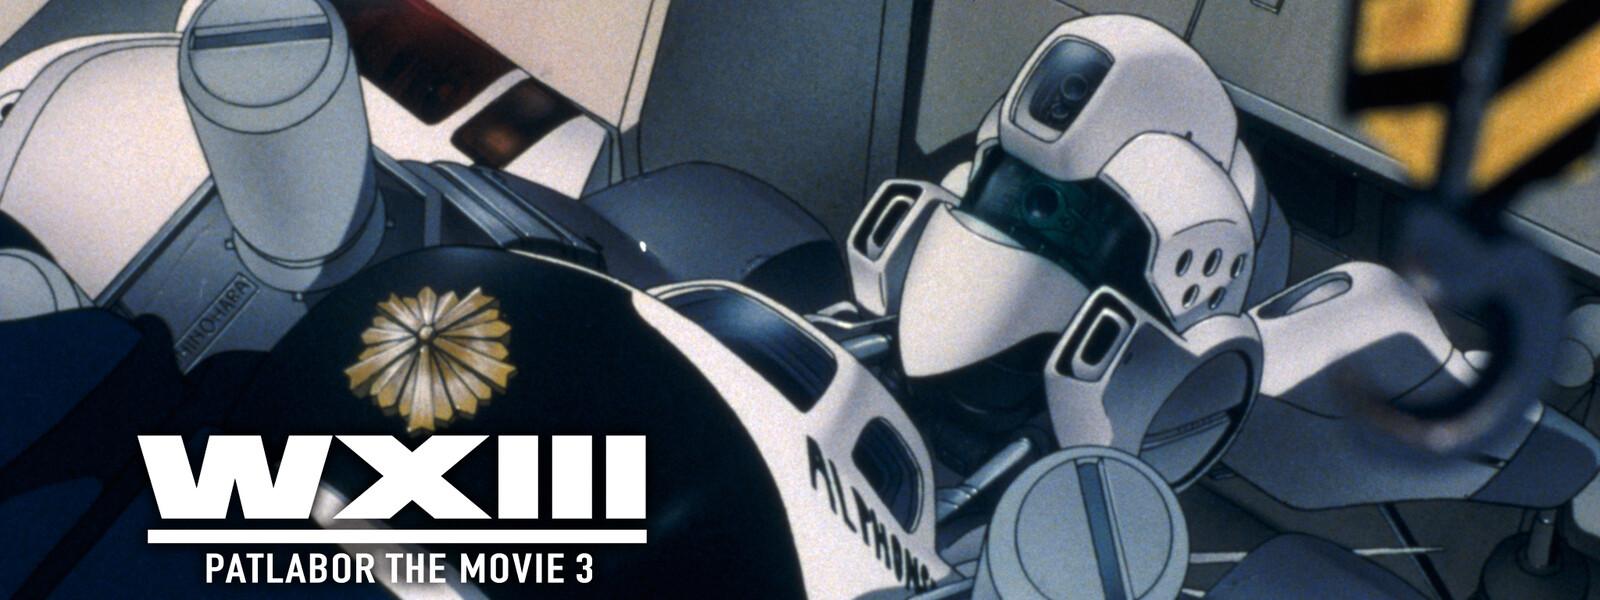 WXIII 機動警察パトレイバー : 無料動画ちゃんねる